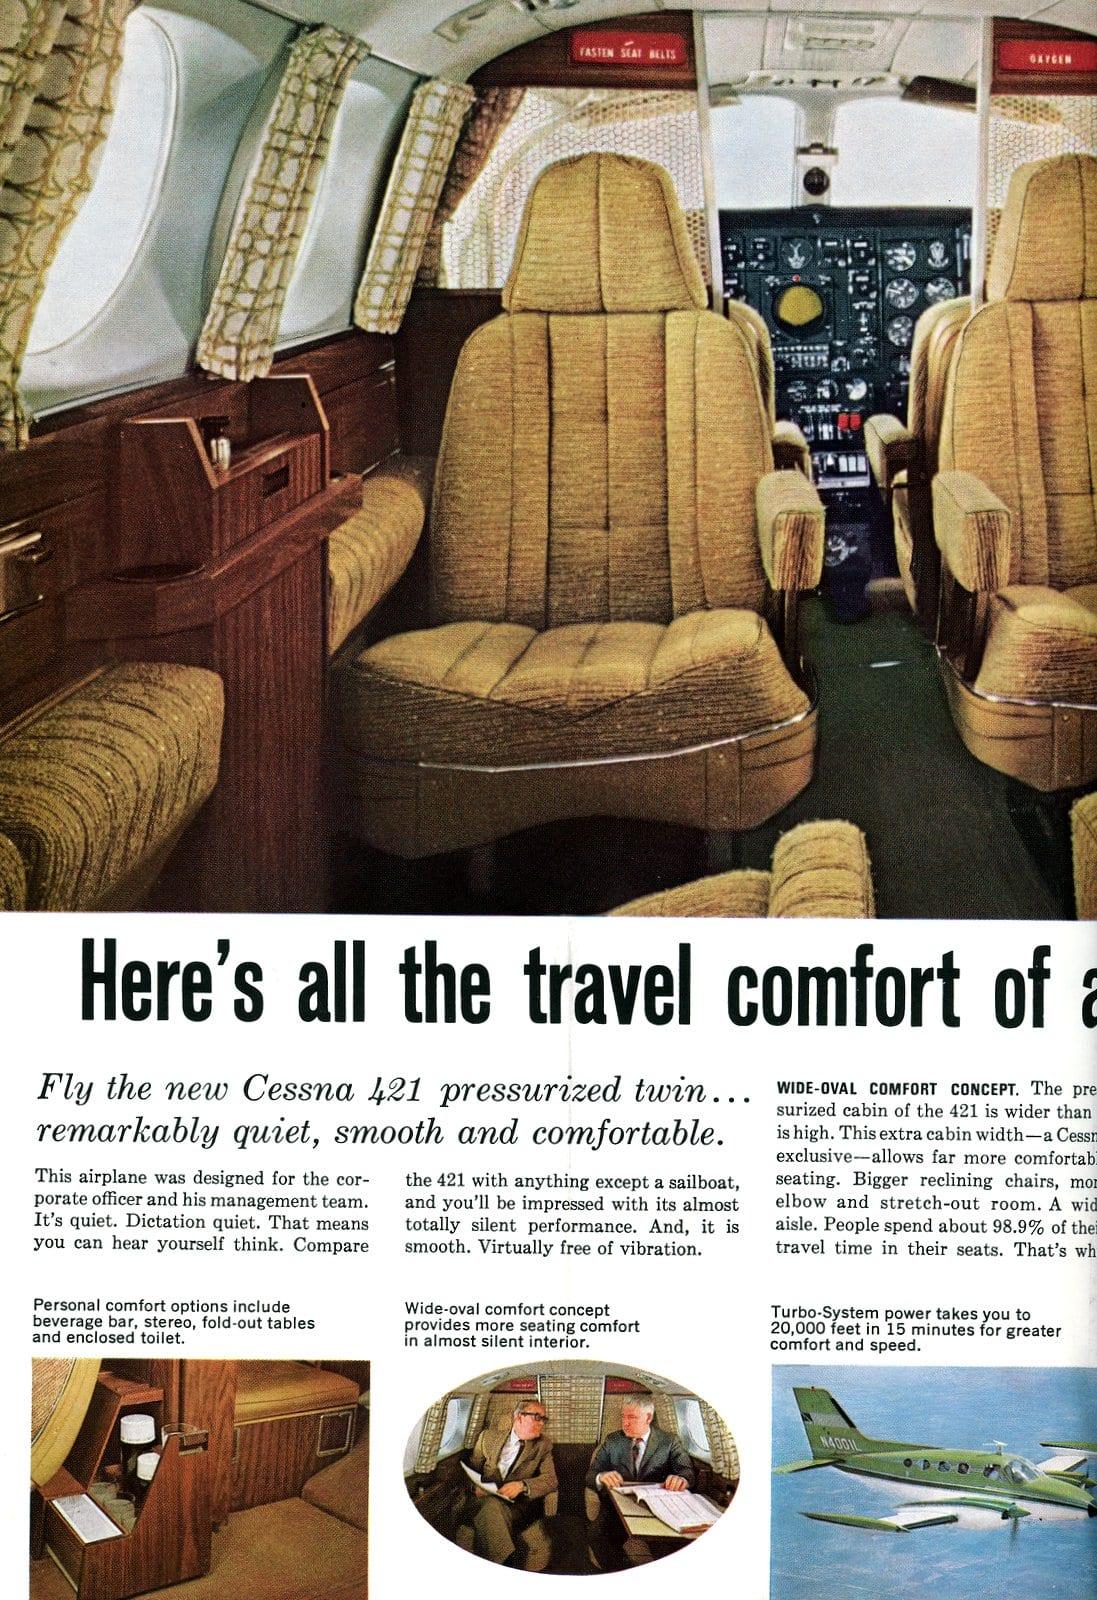 Vintage 1967 Cessna 421 plane interior views (2)